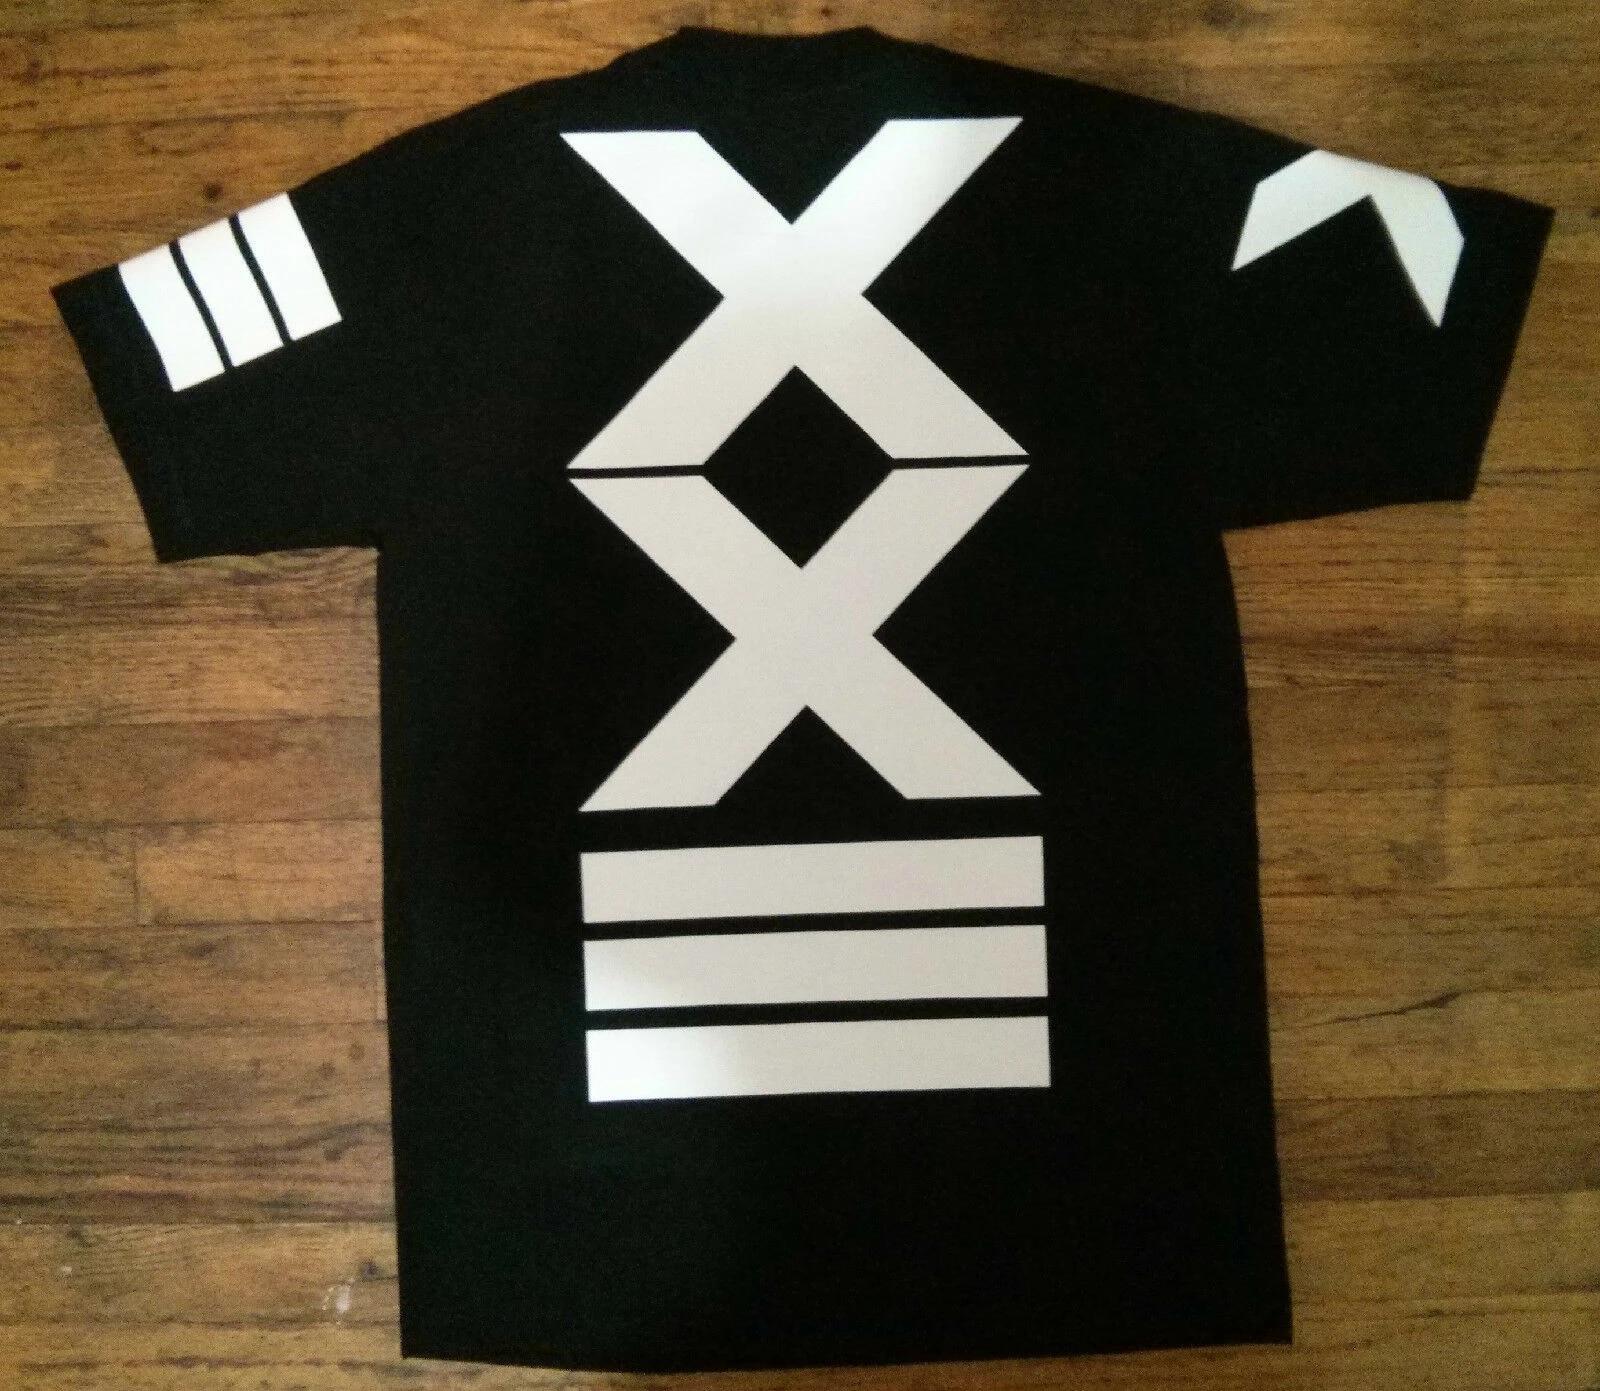 New Stars Jersey T shirt Stripes Hip Hop Cross T-shirt Rap Urban Streetwear Tyga Tees Top Cotton Short Sleeve Tshirt